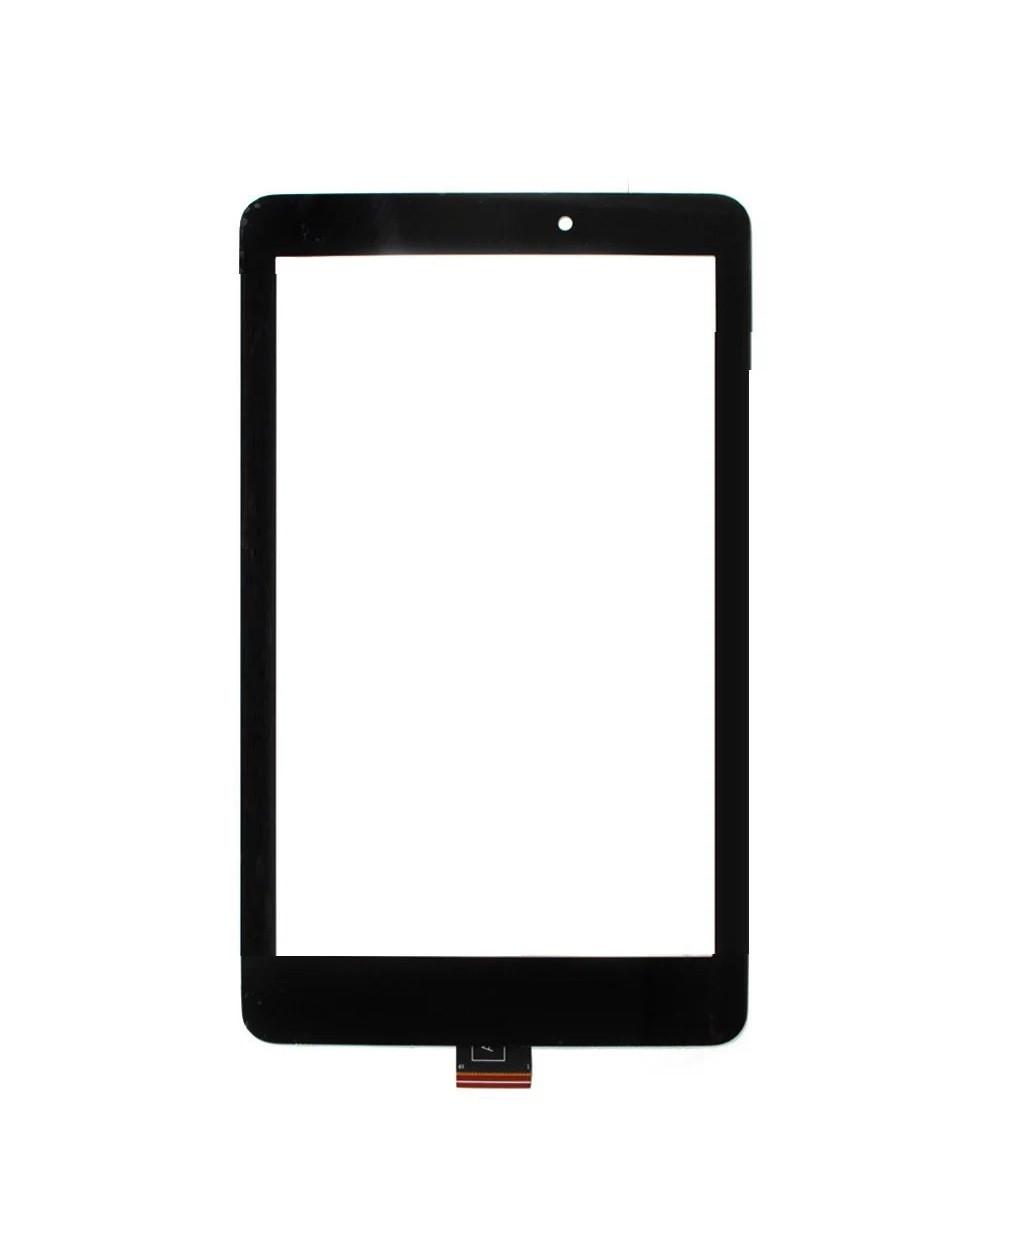 Сенсор (Тачскрин) для планшета Acer A1-840 Iconia TAB | A1-840FHD Iconia Tab 8 (Черный) Оригинал Китай